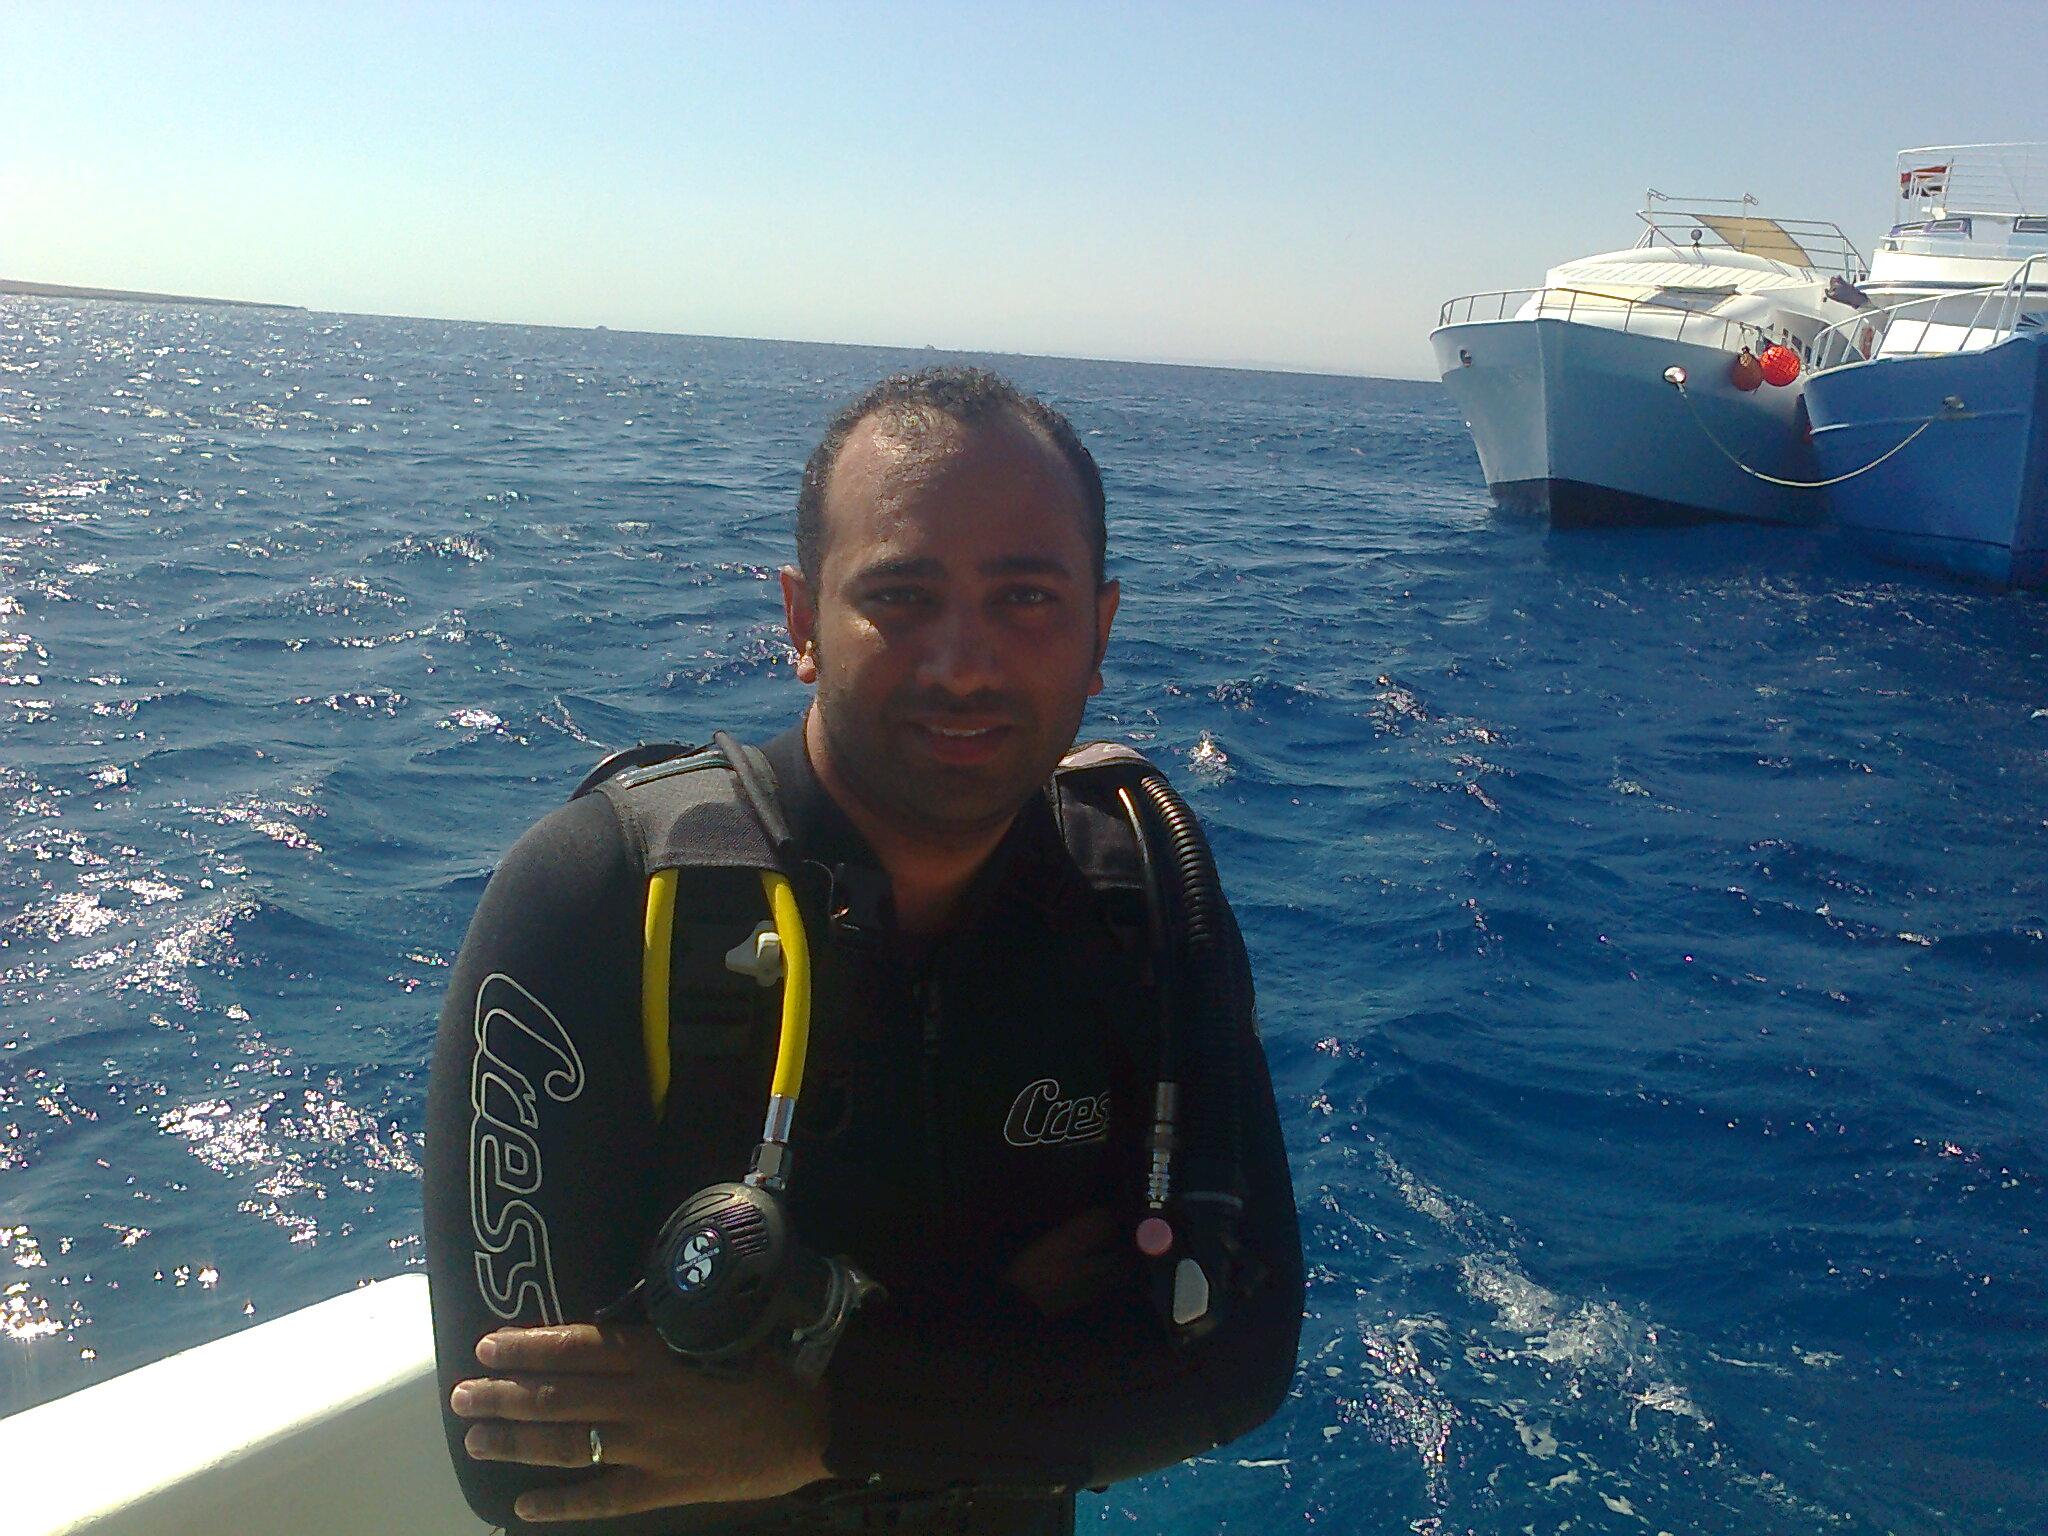 Amin Roushdy Mohamed Esmail